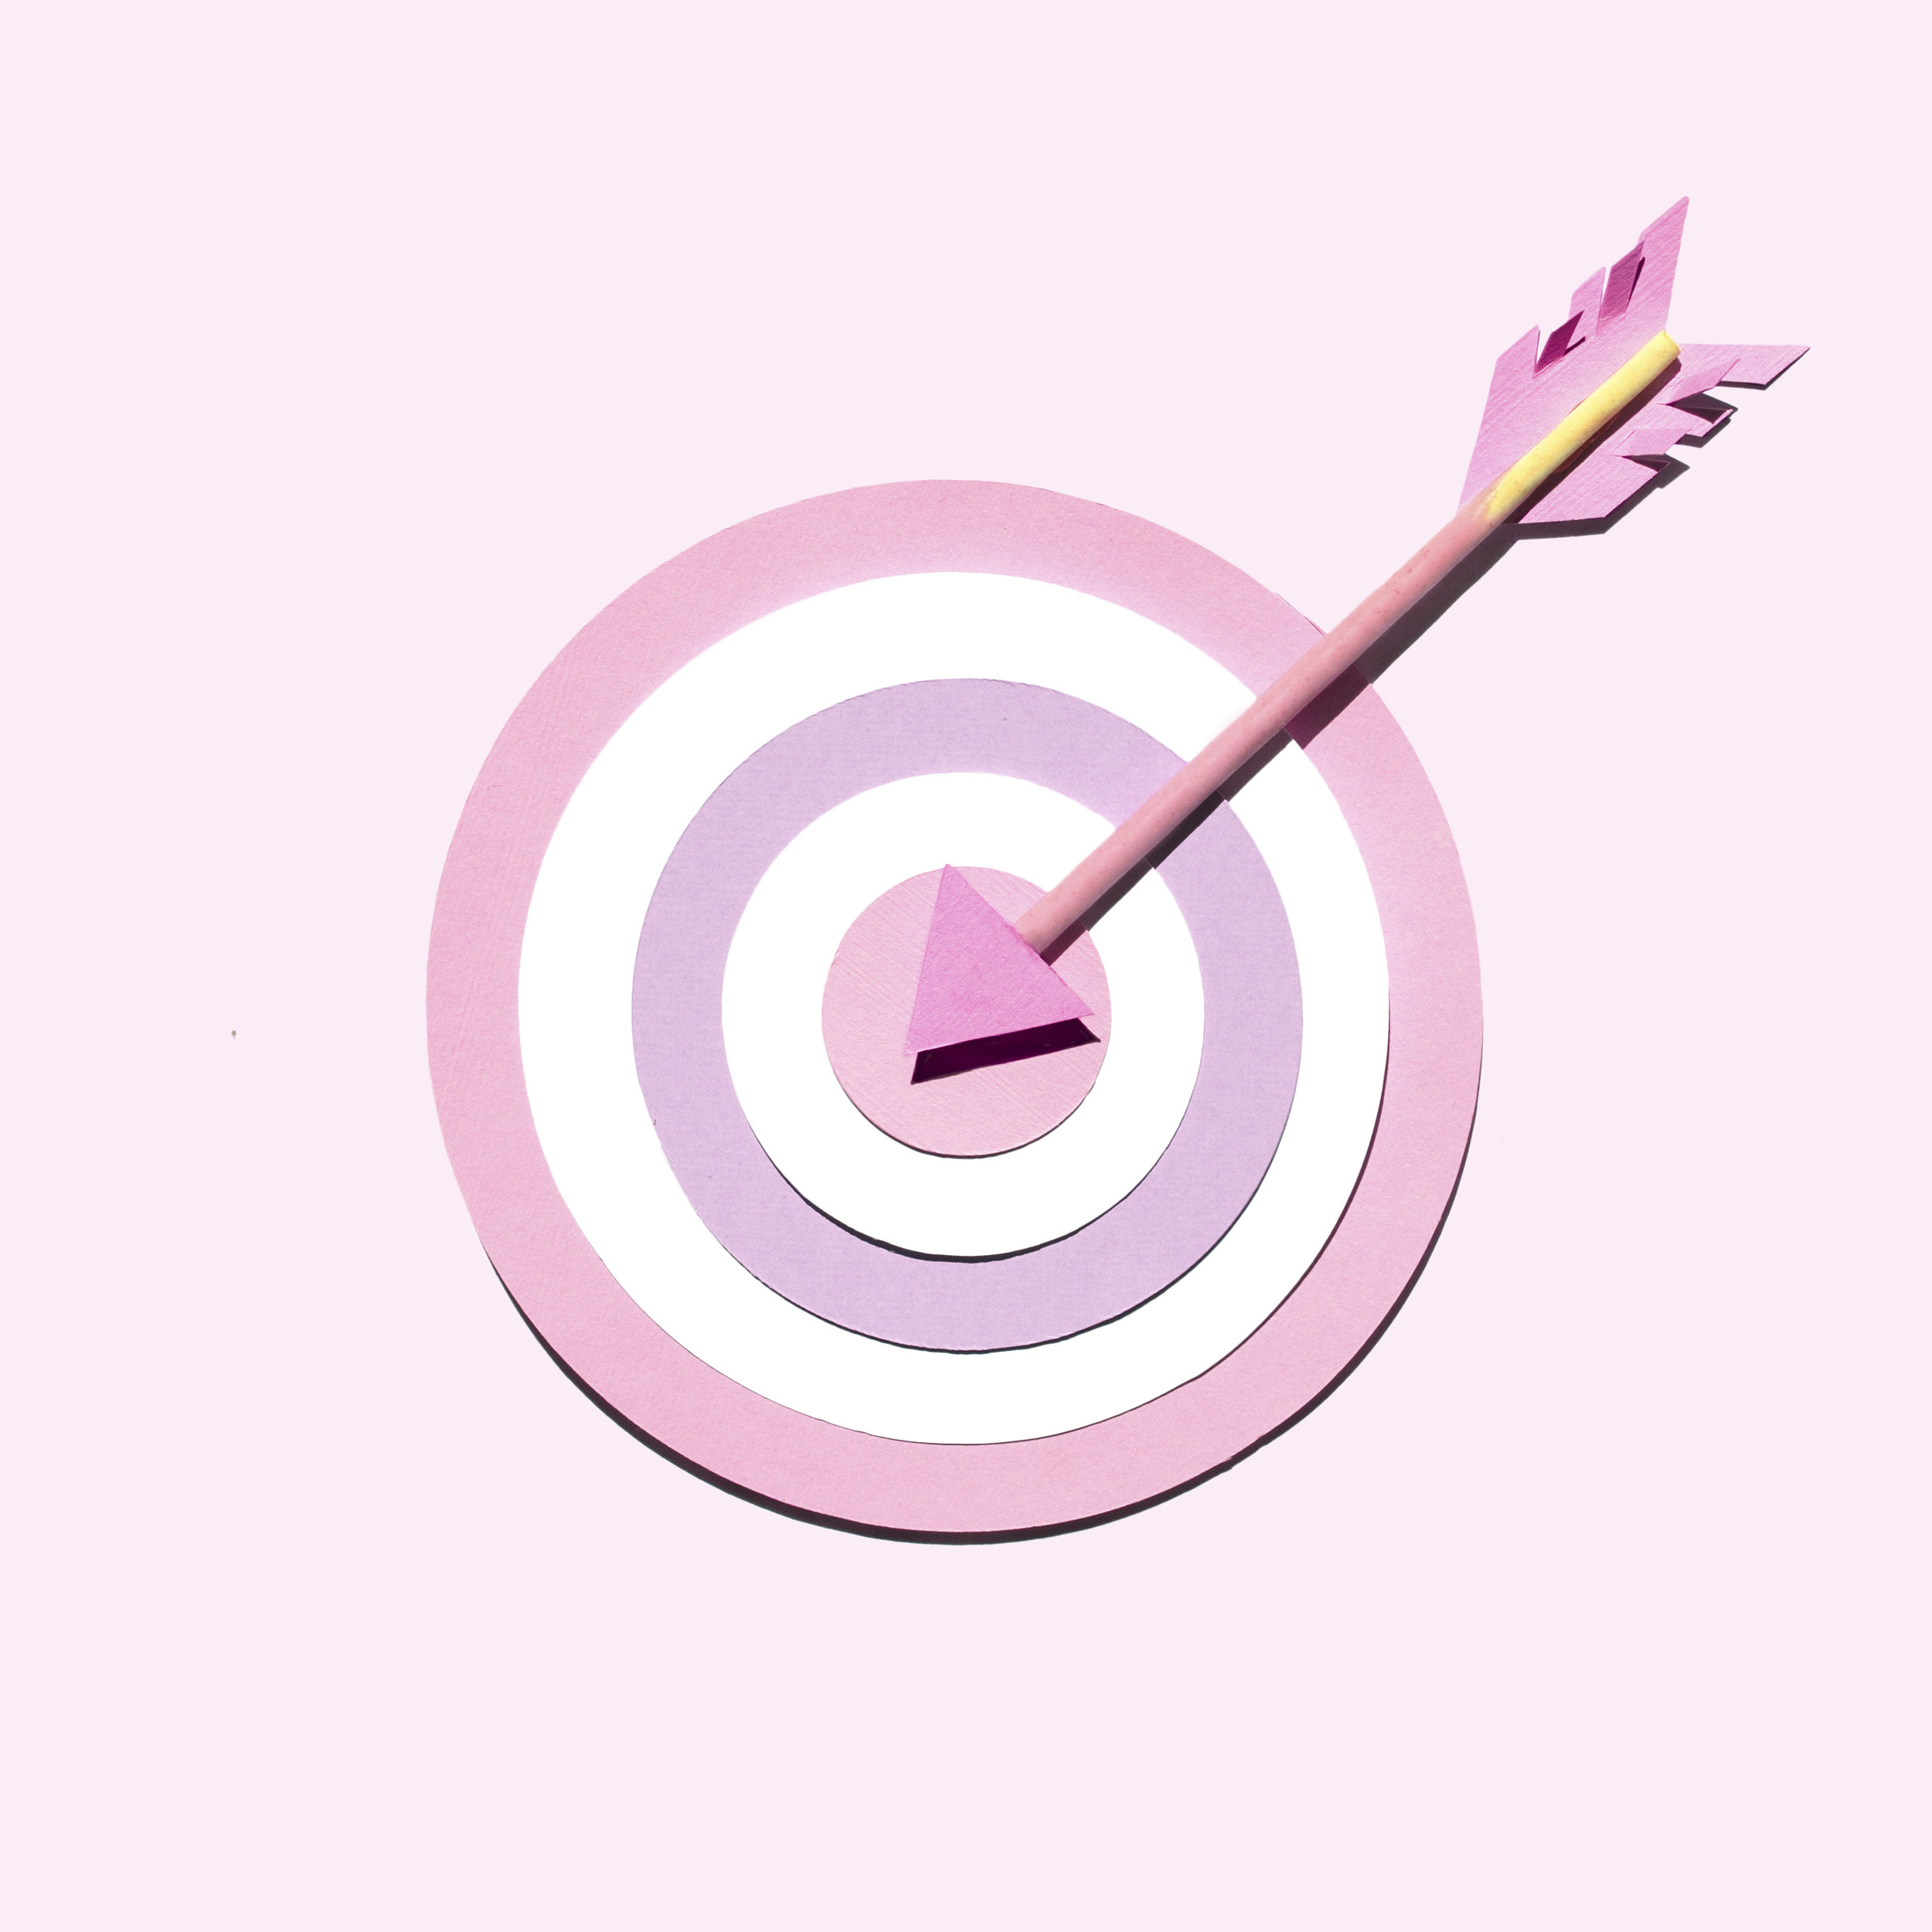 pocky-bullseye.jpg